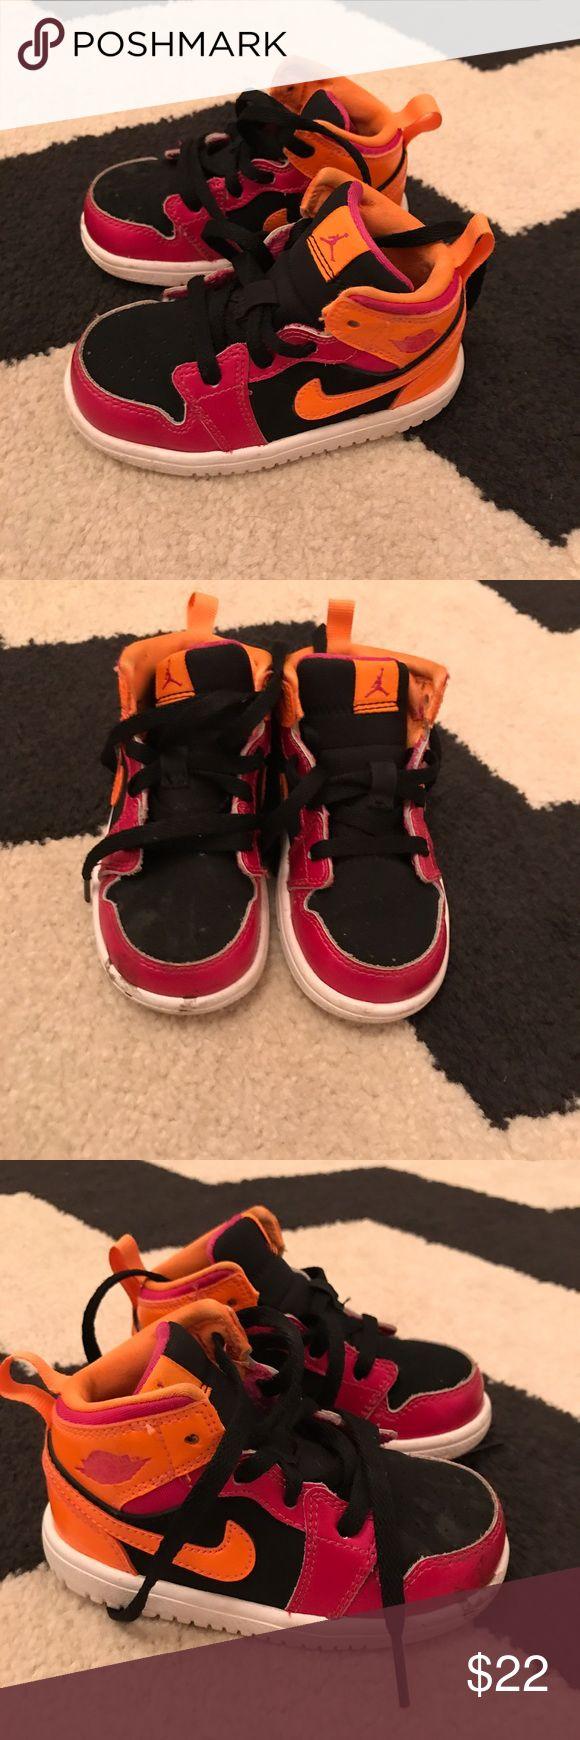 🍼 Toddler Air Jordan Hightop Sneakers sz 6 🍼 Super cute, Nike Air Jordan Toddler Hightop Sneakers. Size 6 Pink Orange Neon Nike Shoes Sneakers